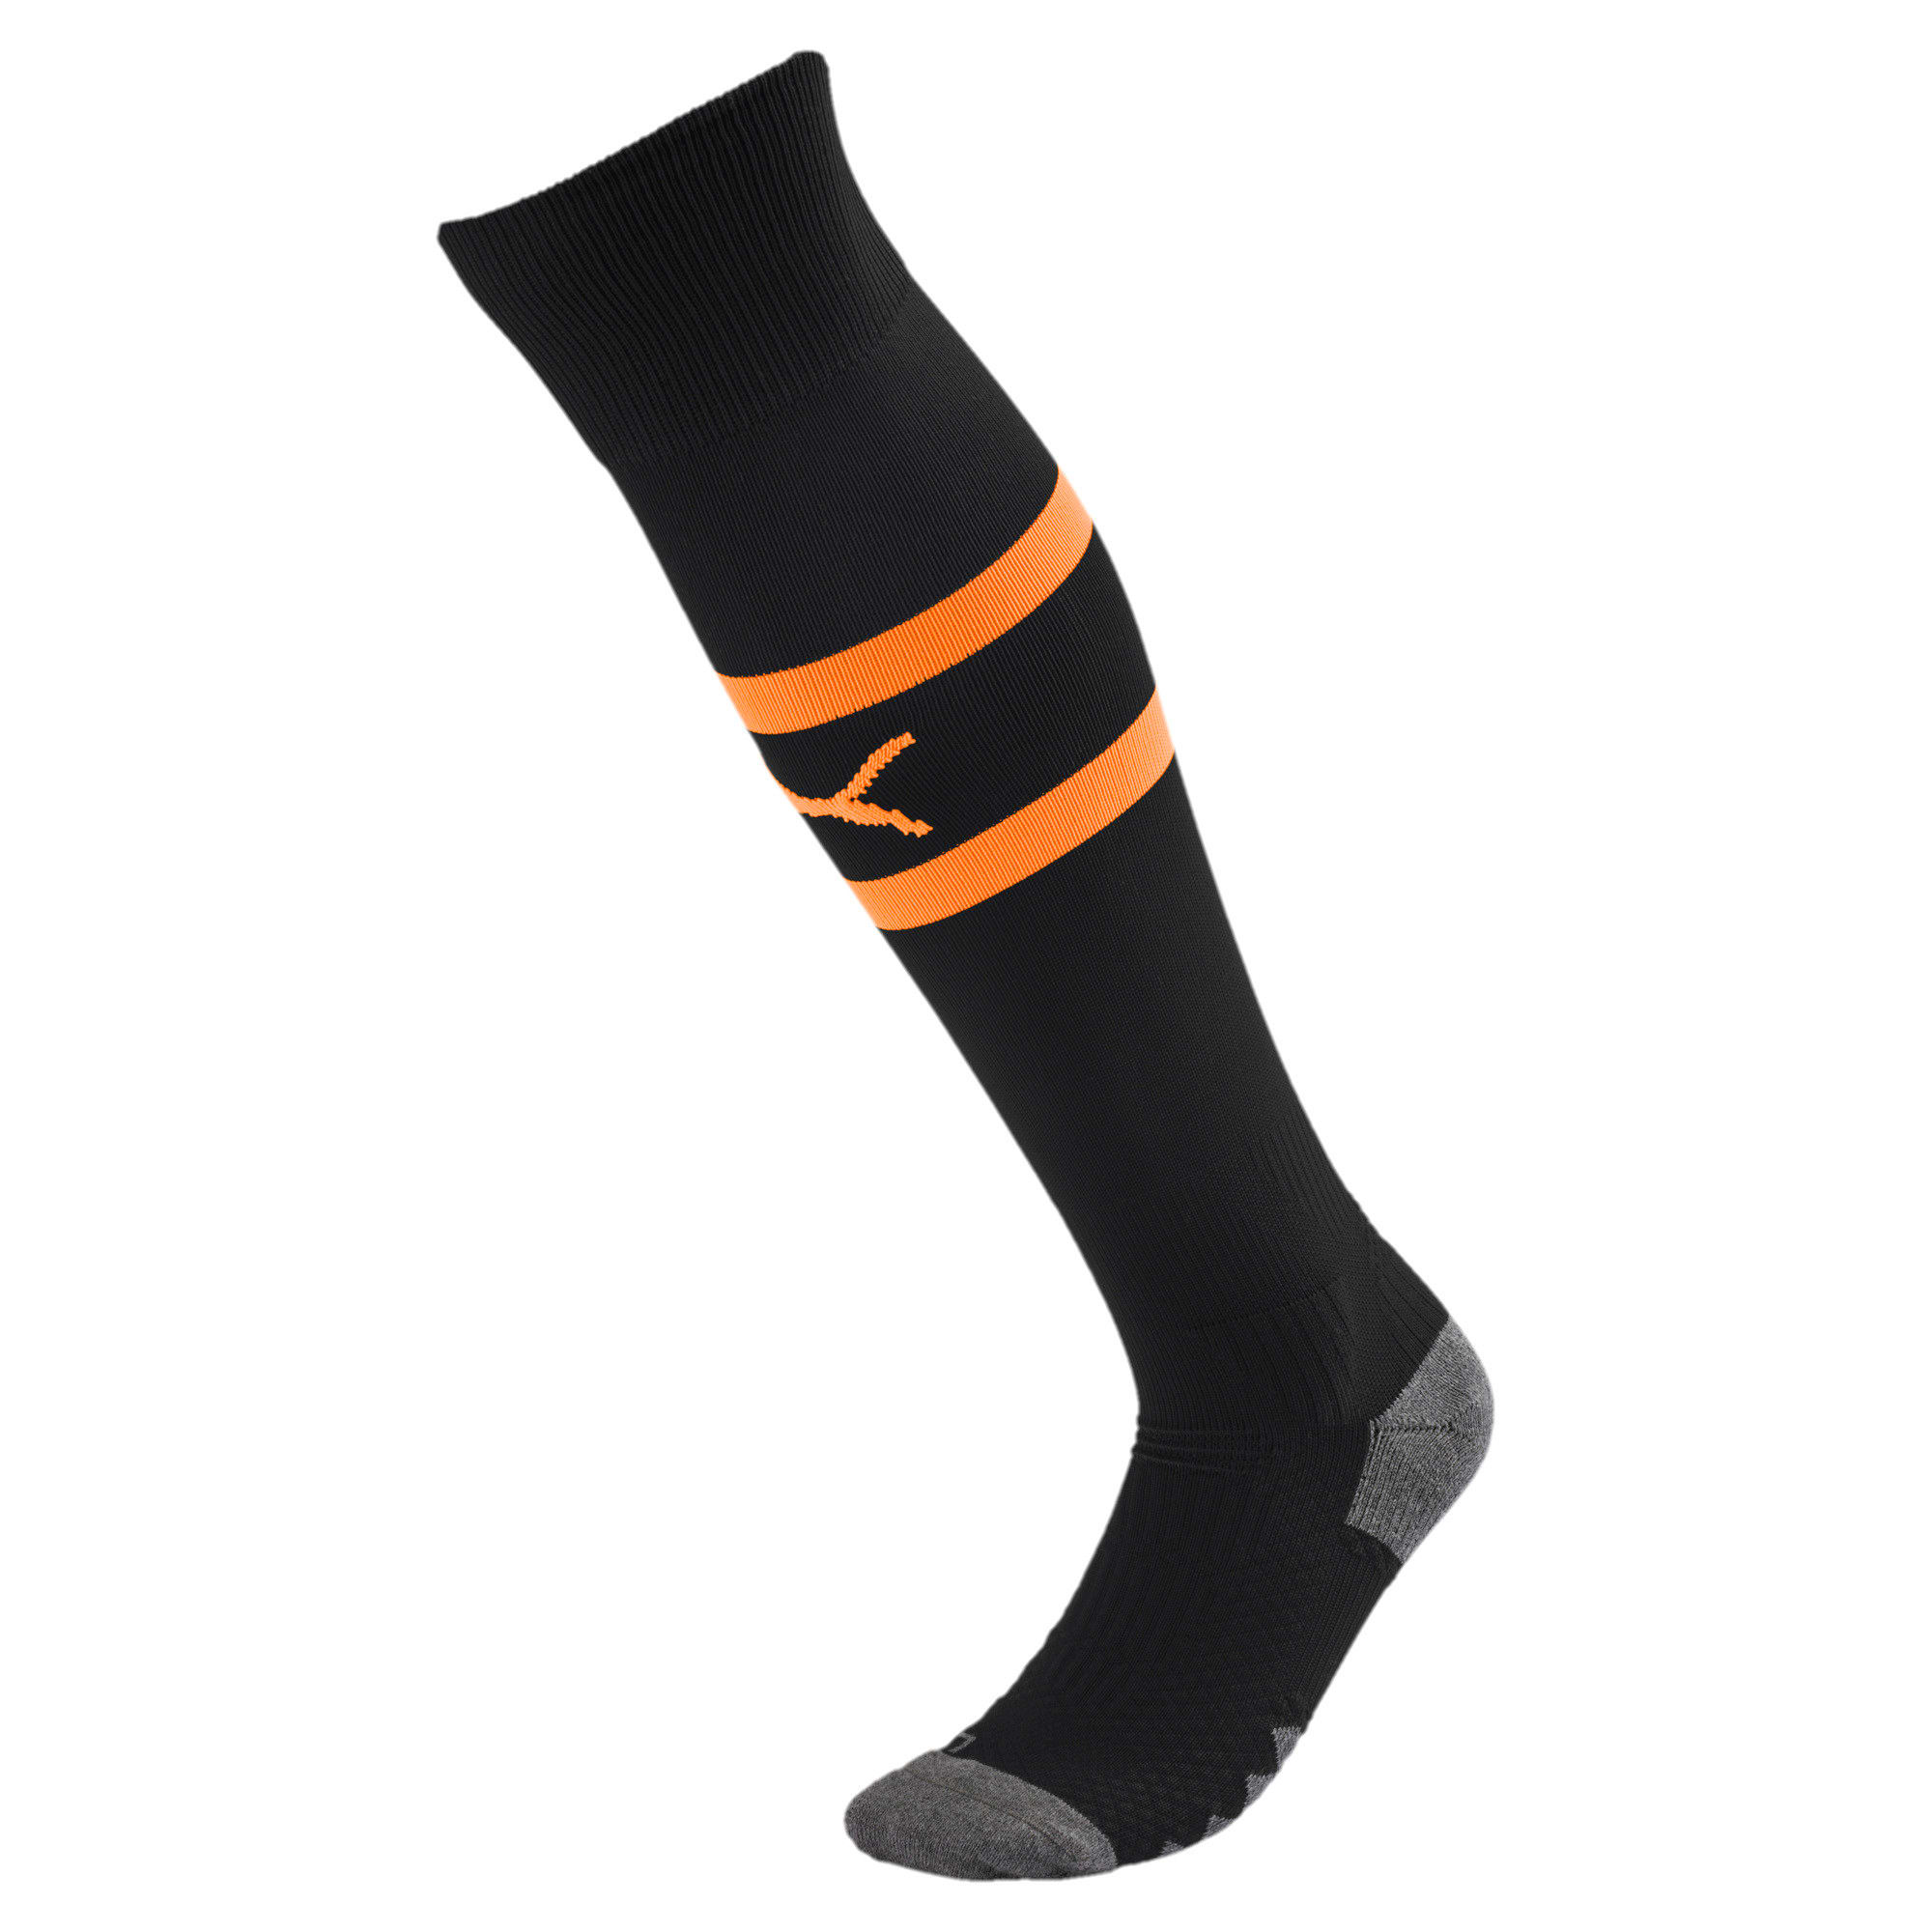 Thumbnail 1 of Valencia CF Herren Band Socken, Puma Black-Vibrant Orange, medium